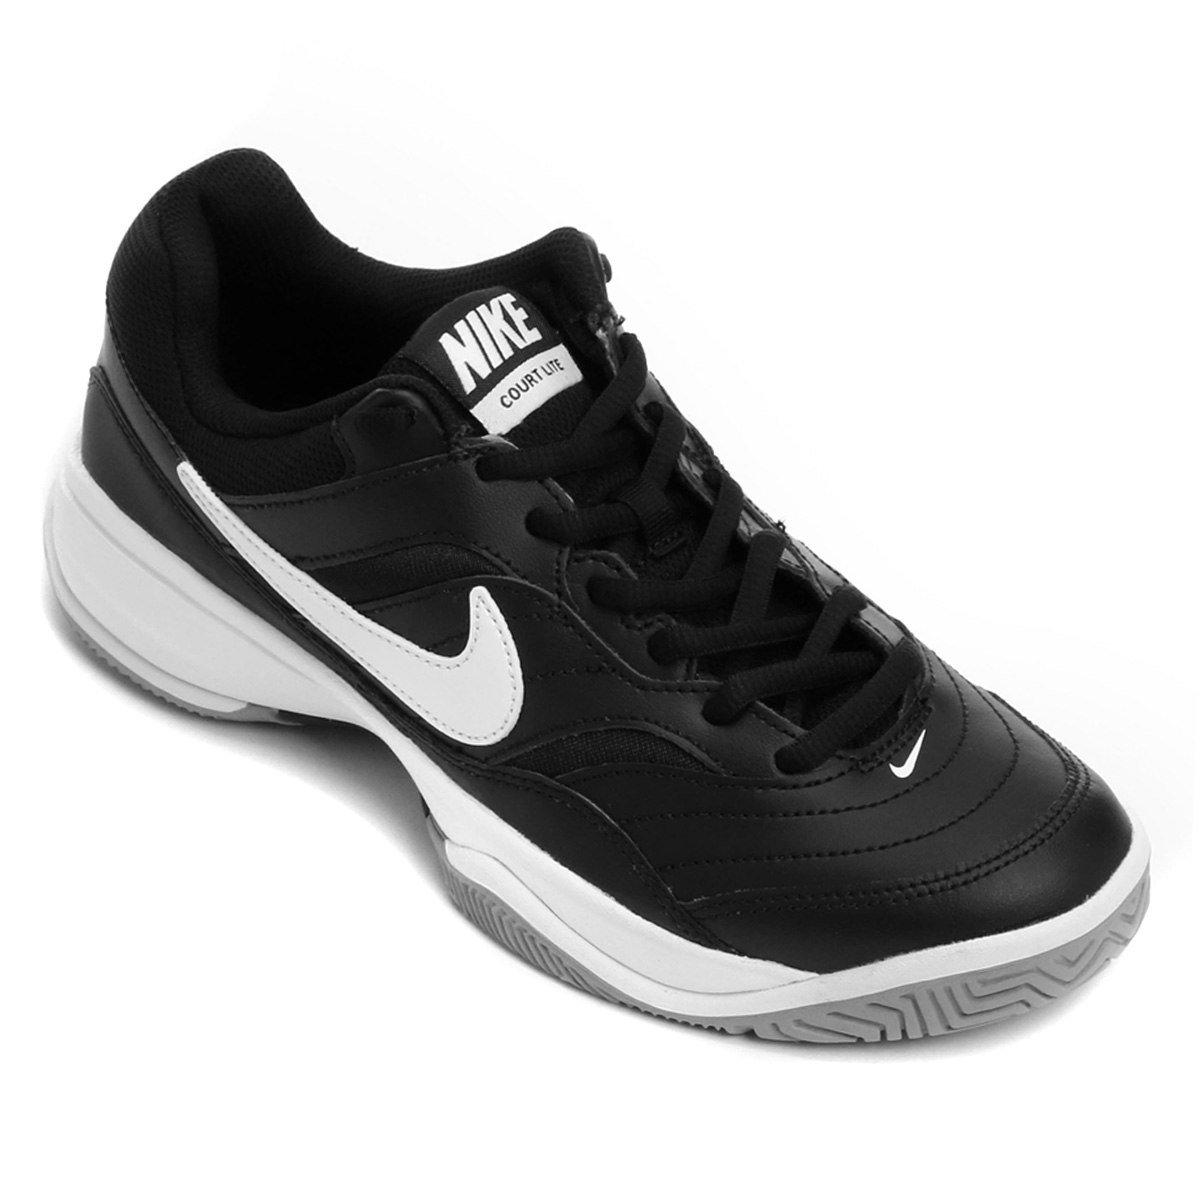 size 40 832d2 45d4a Tênis Nike Court Lite